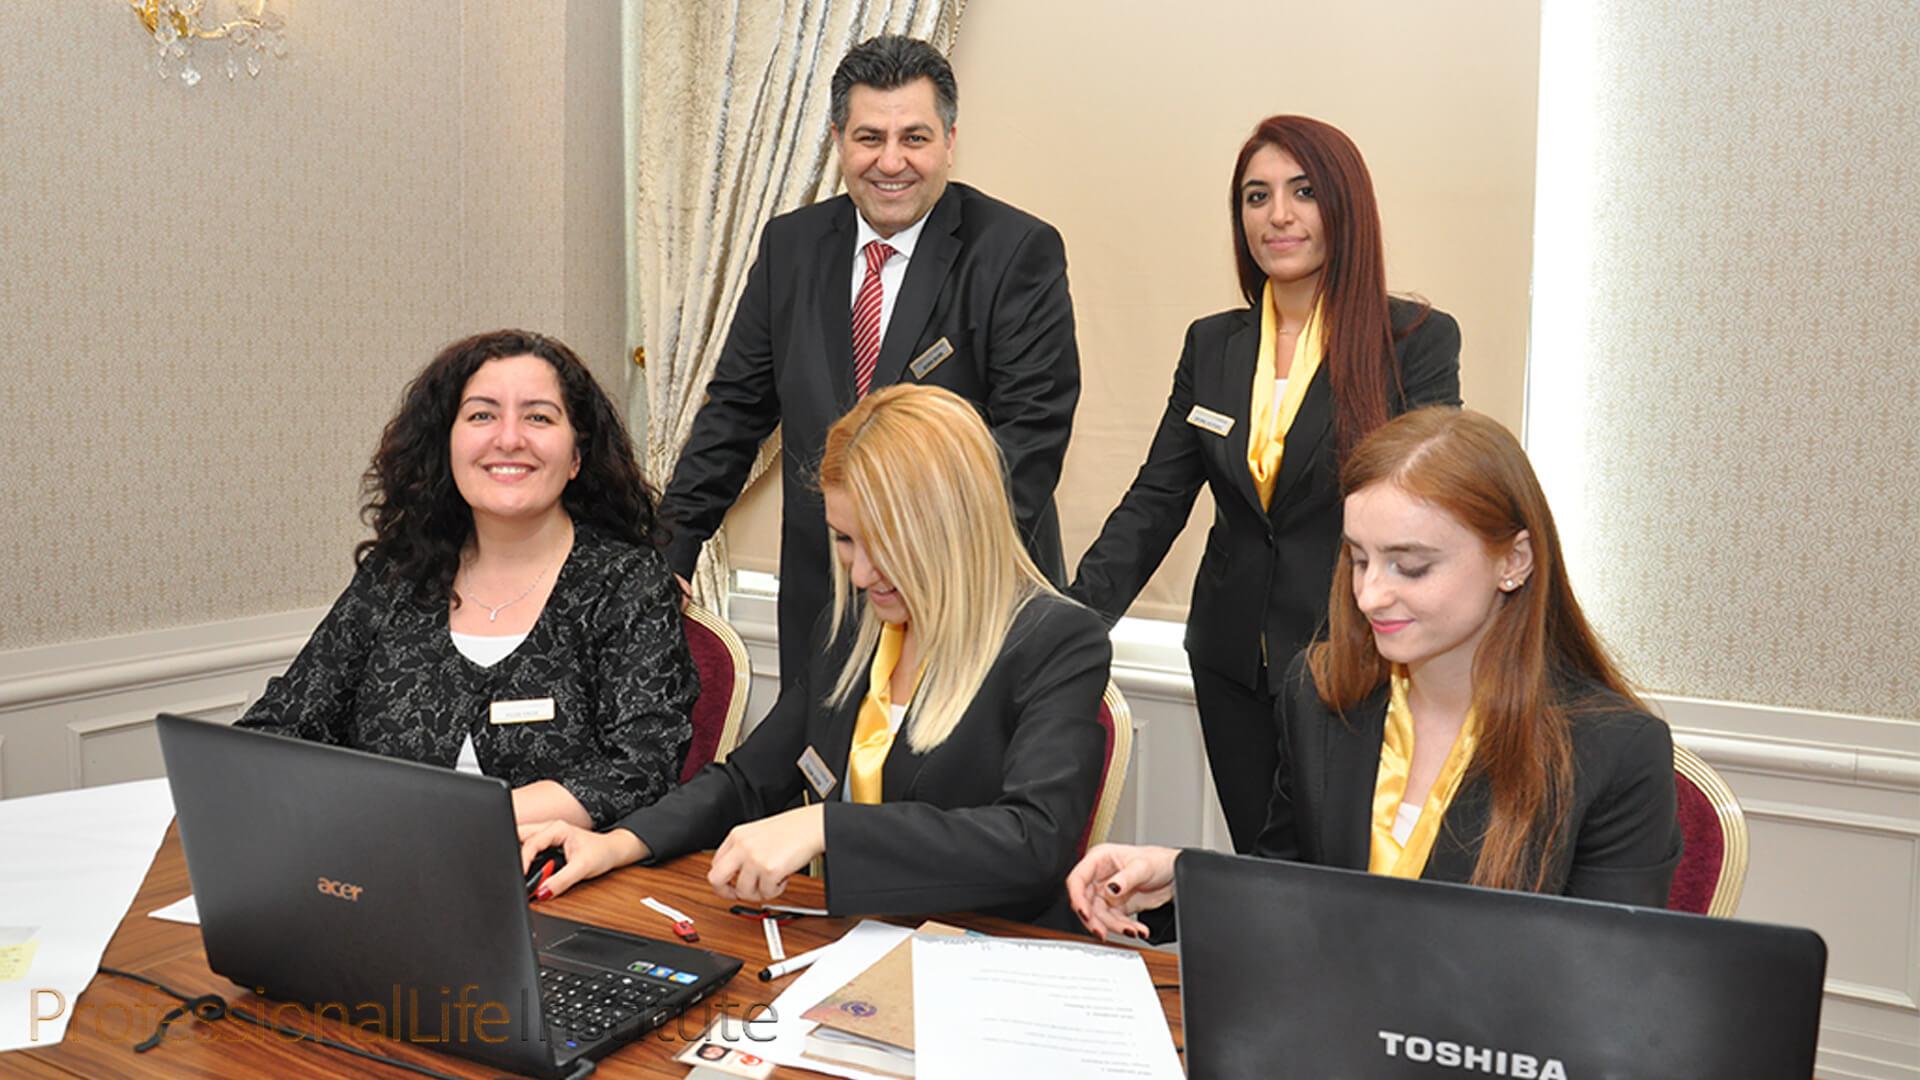 istanbul-kentsel-tasarim-rehberi-arama-konferansi